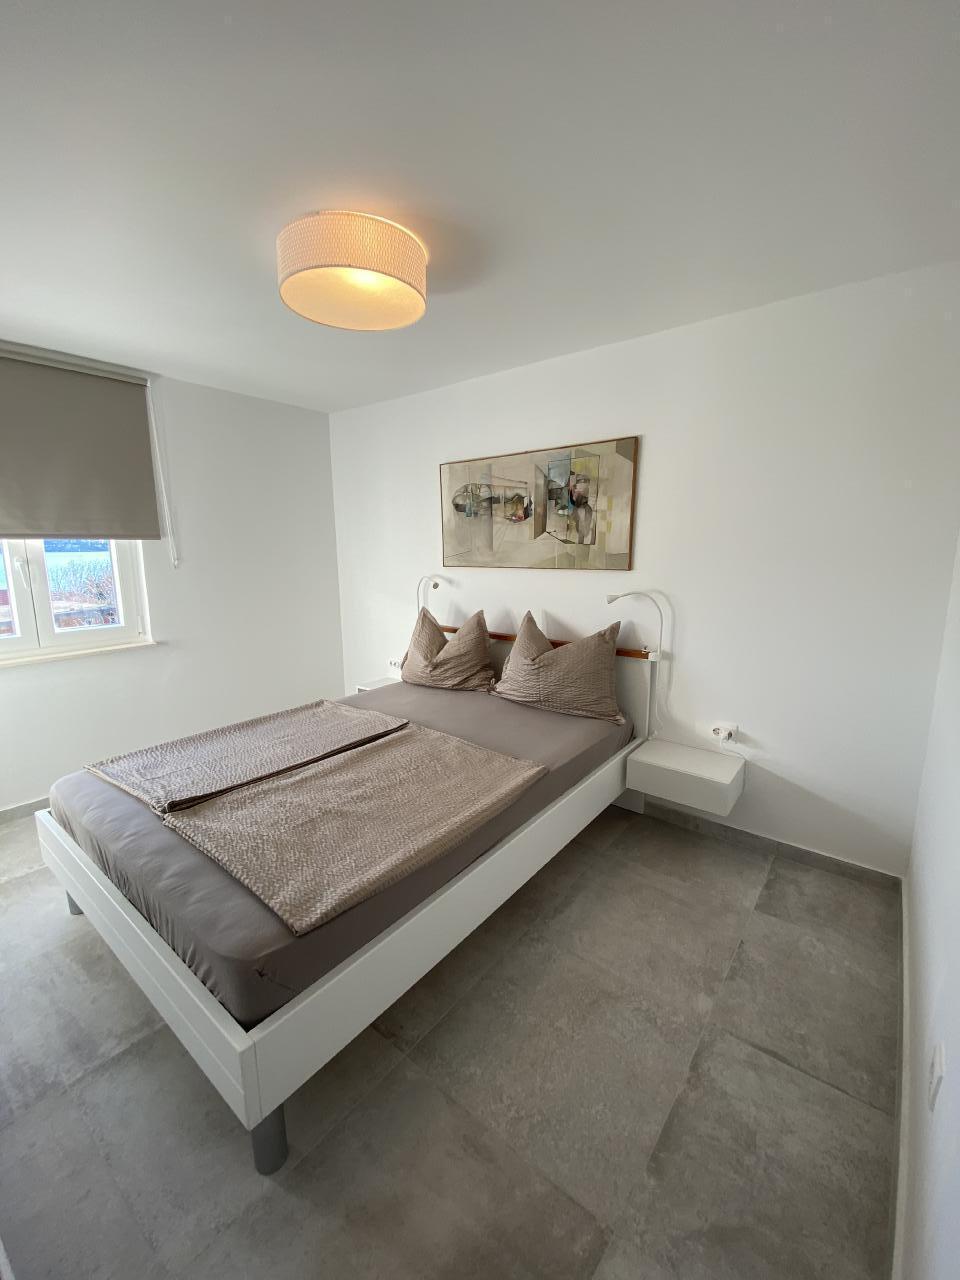 Ferienwohnung Casa Anica Apartment Bellevue (656993), Kuciste, Insel Peljesac, Dalmatien, Kroatien, Bild 16